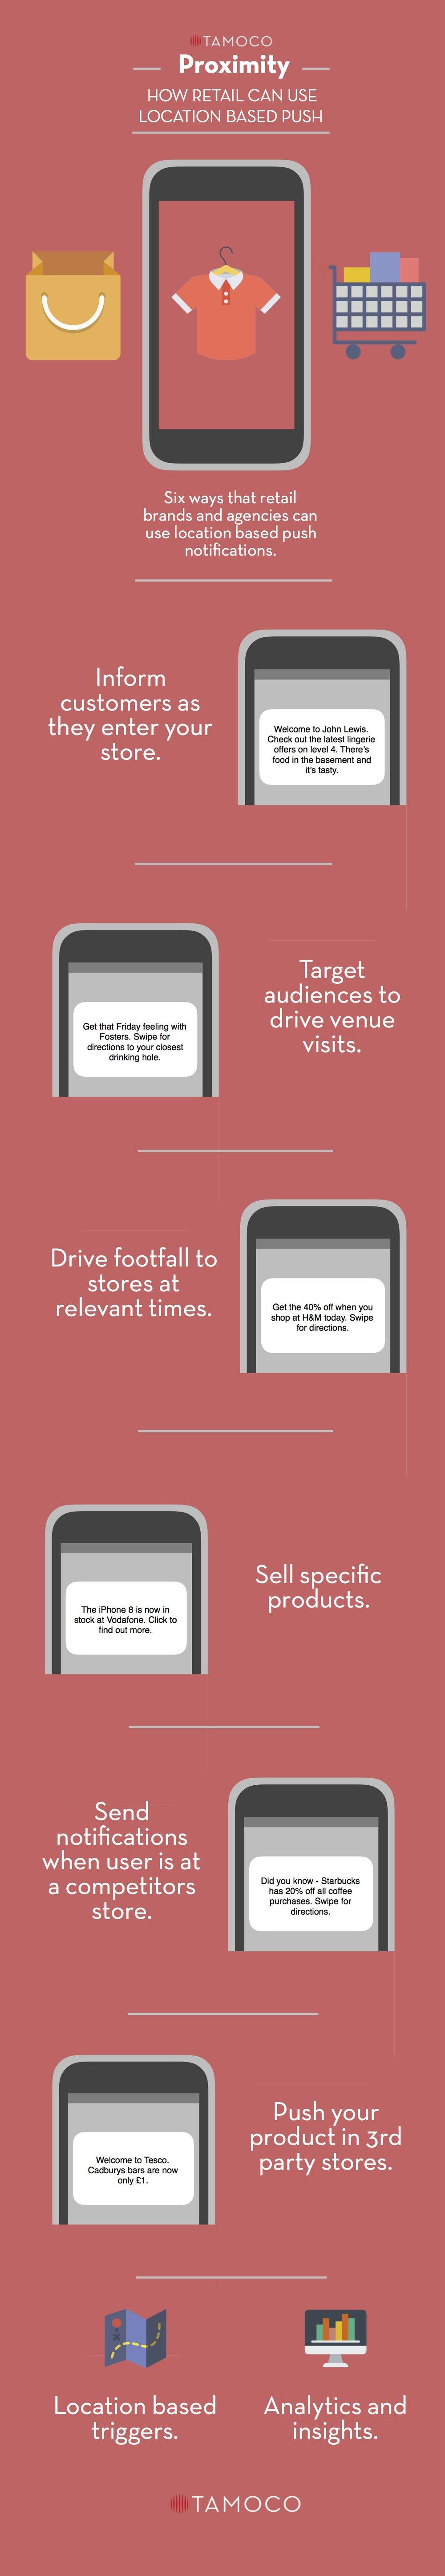 #retail #push #location #notification #marketing #brands #agencies